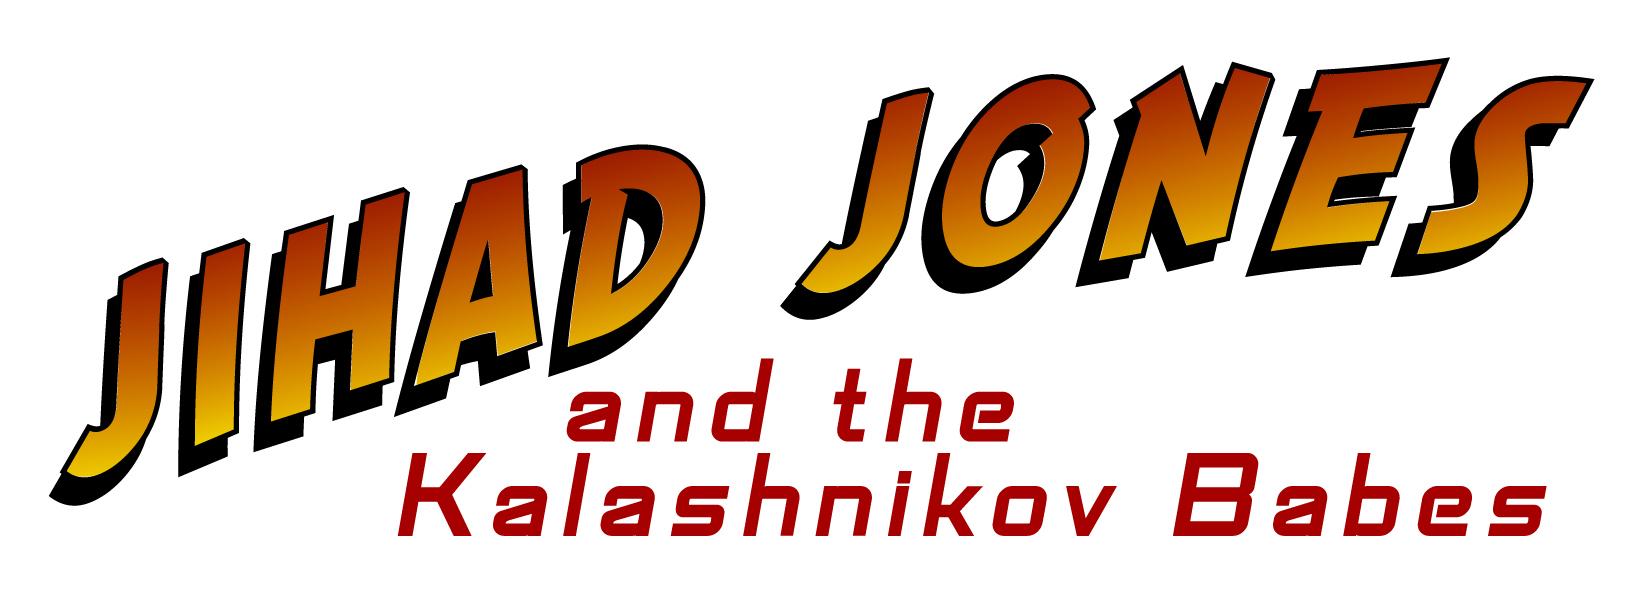 Jihad Jones and the Kalashnikov Babes